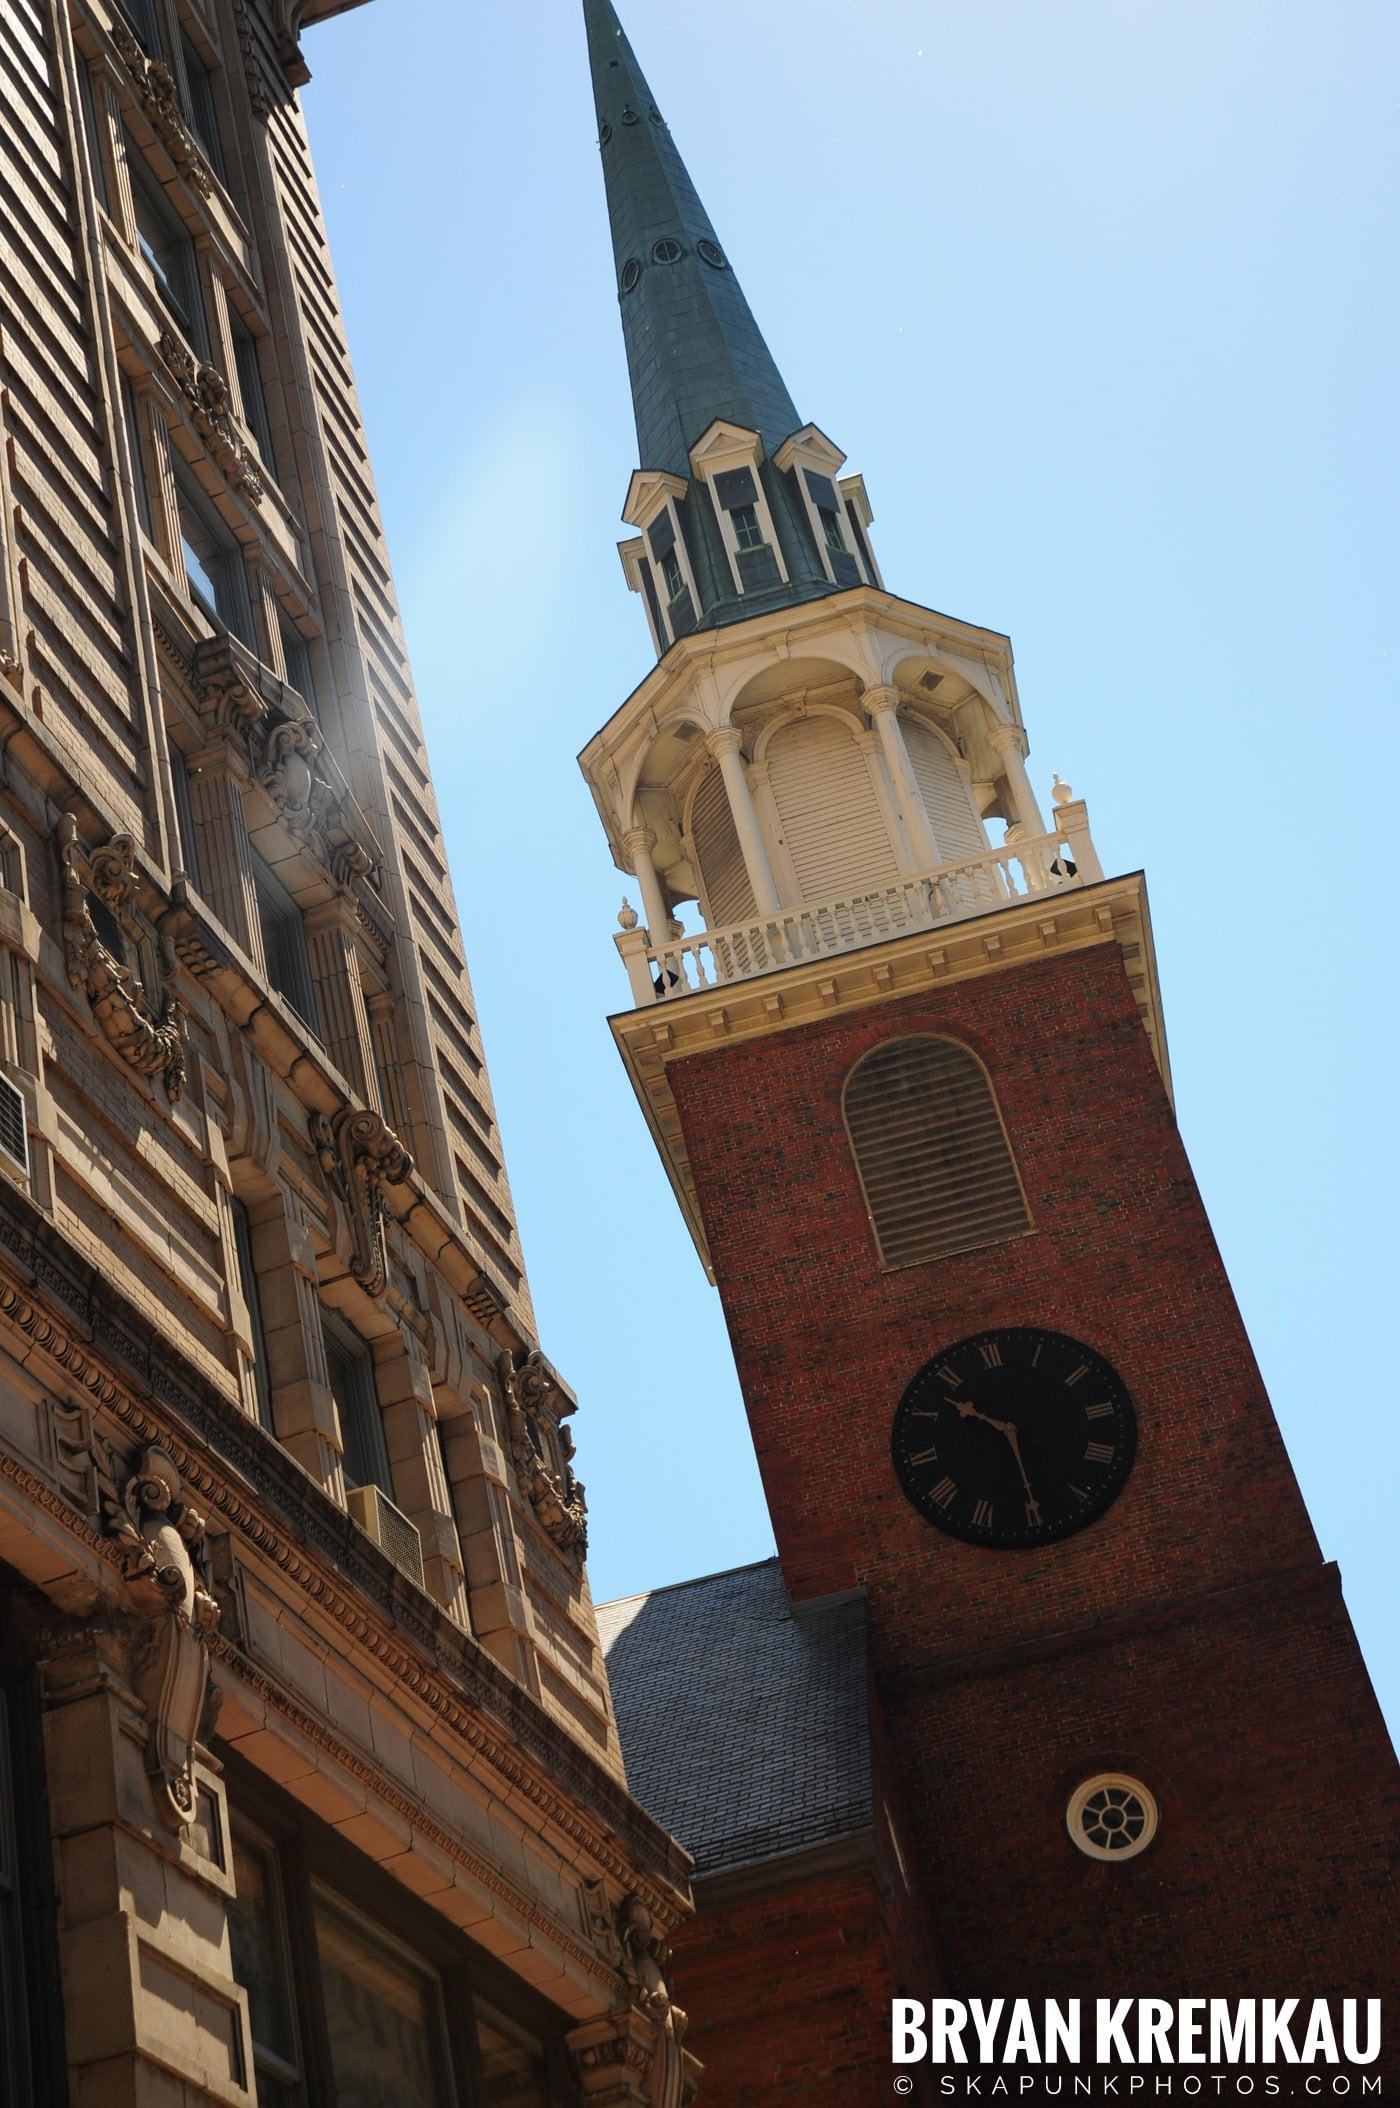 Memorial Day Weekend Trip to Boston - 5.25.08 (1)